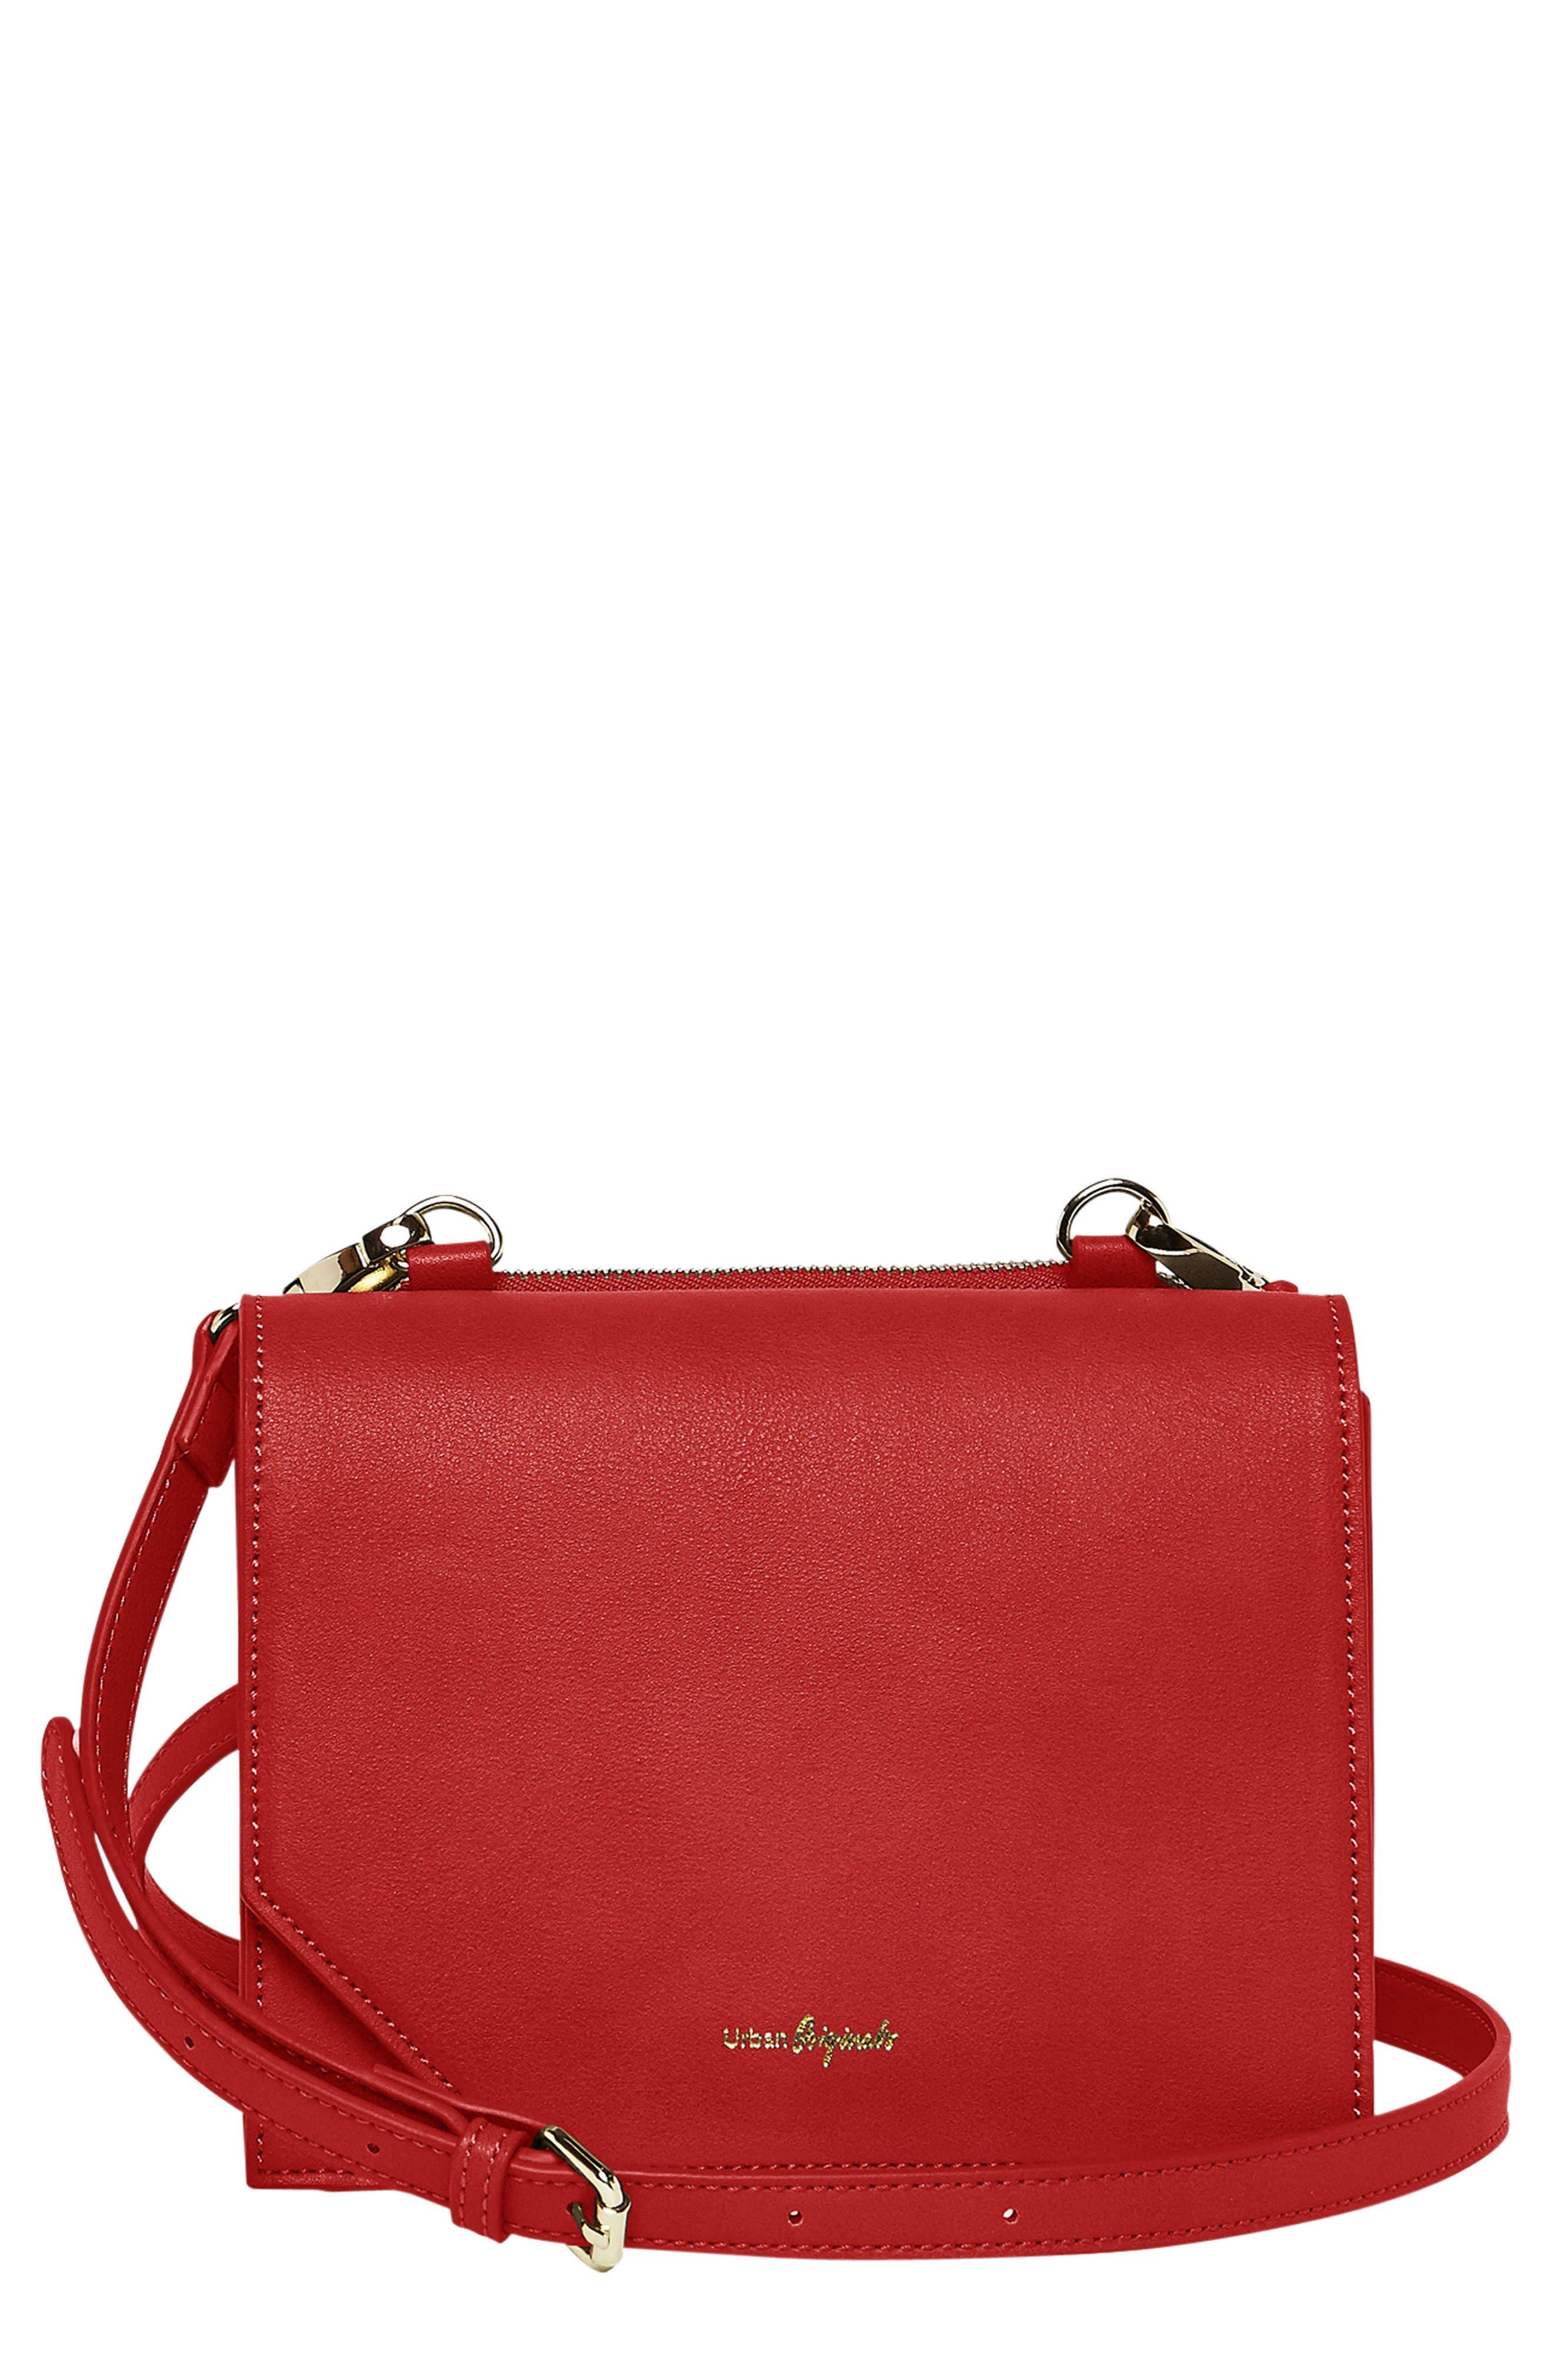 Shining Star Vegan Leather Crossbody Bag,                             Main thumbnail 1, color,                             Red